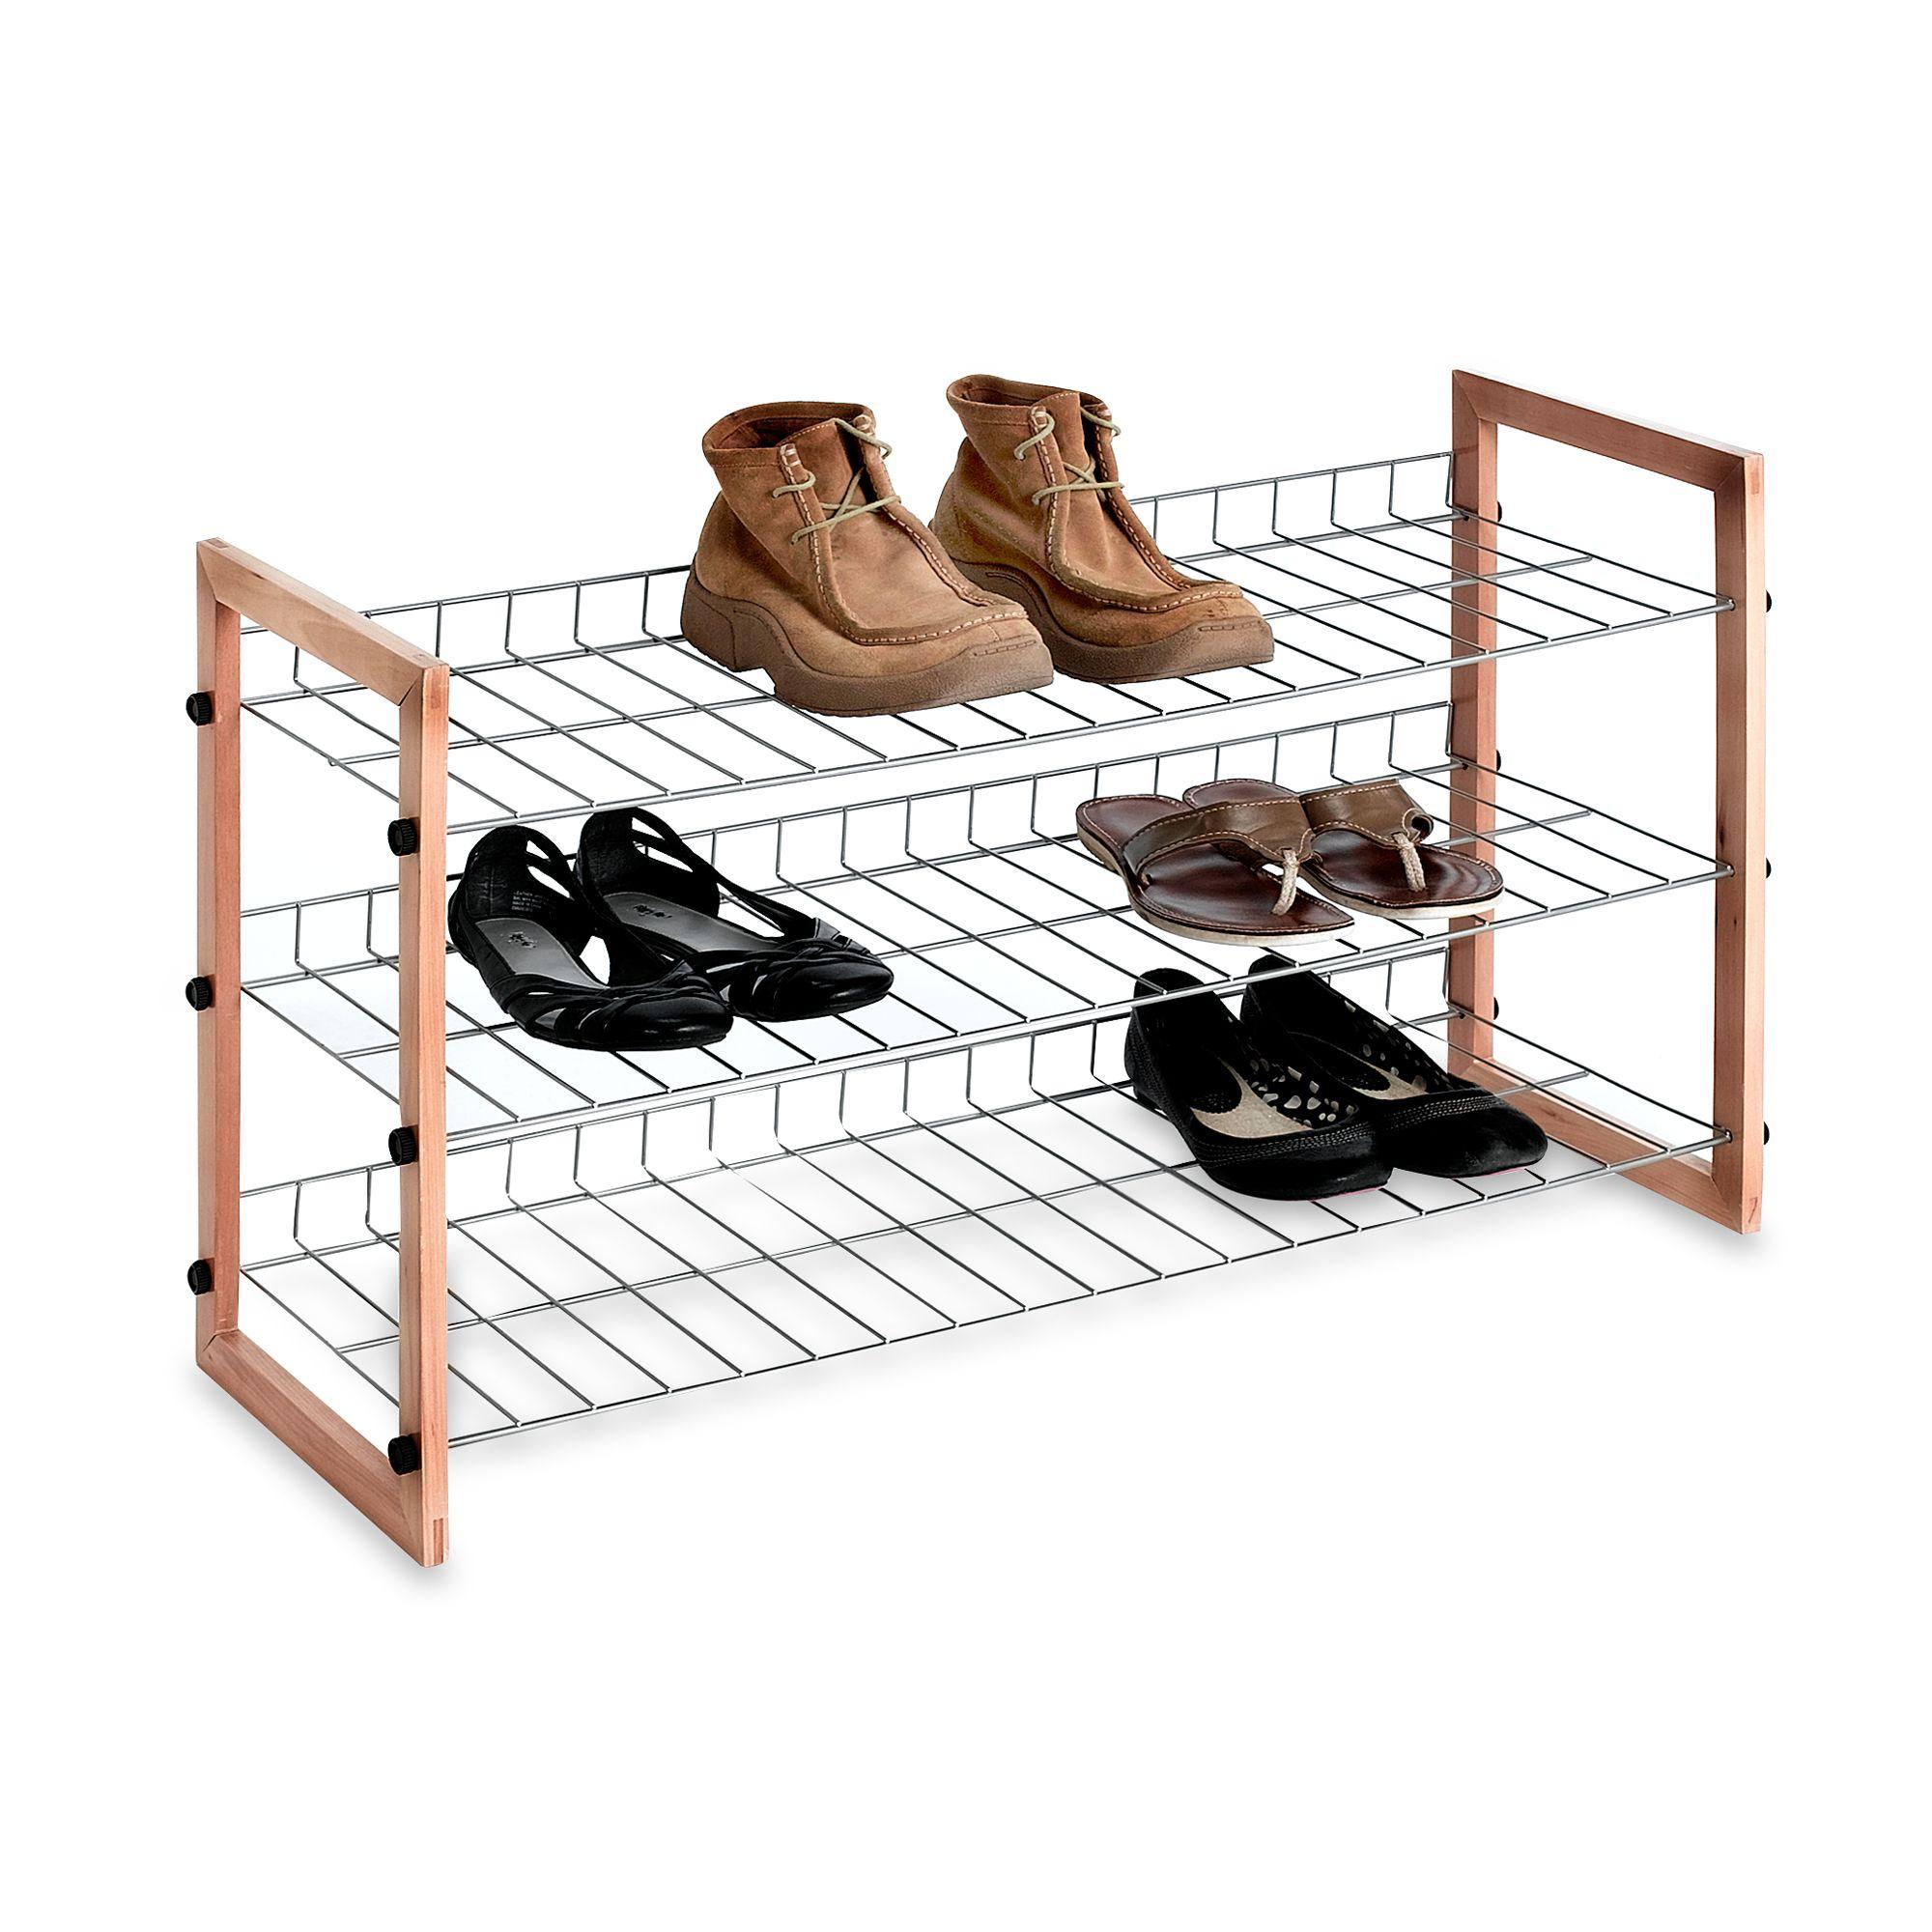 3 shelf wooden metal shoe rack bed bath beyond 3 shelf wooden metal shoe rack